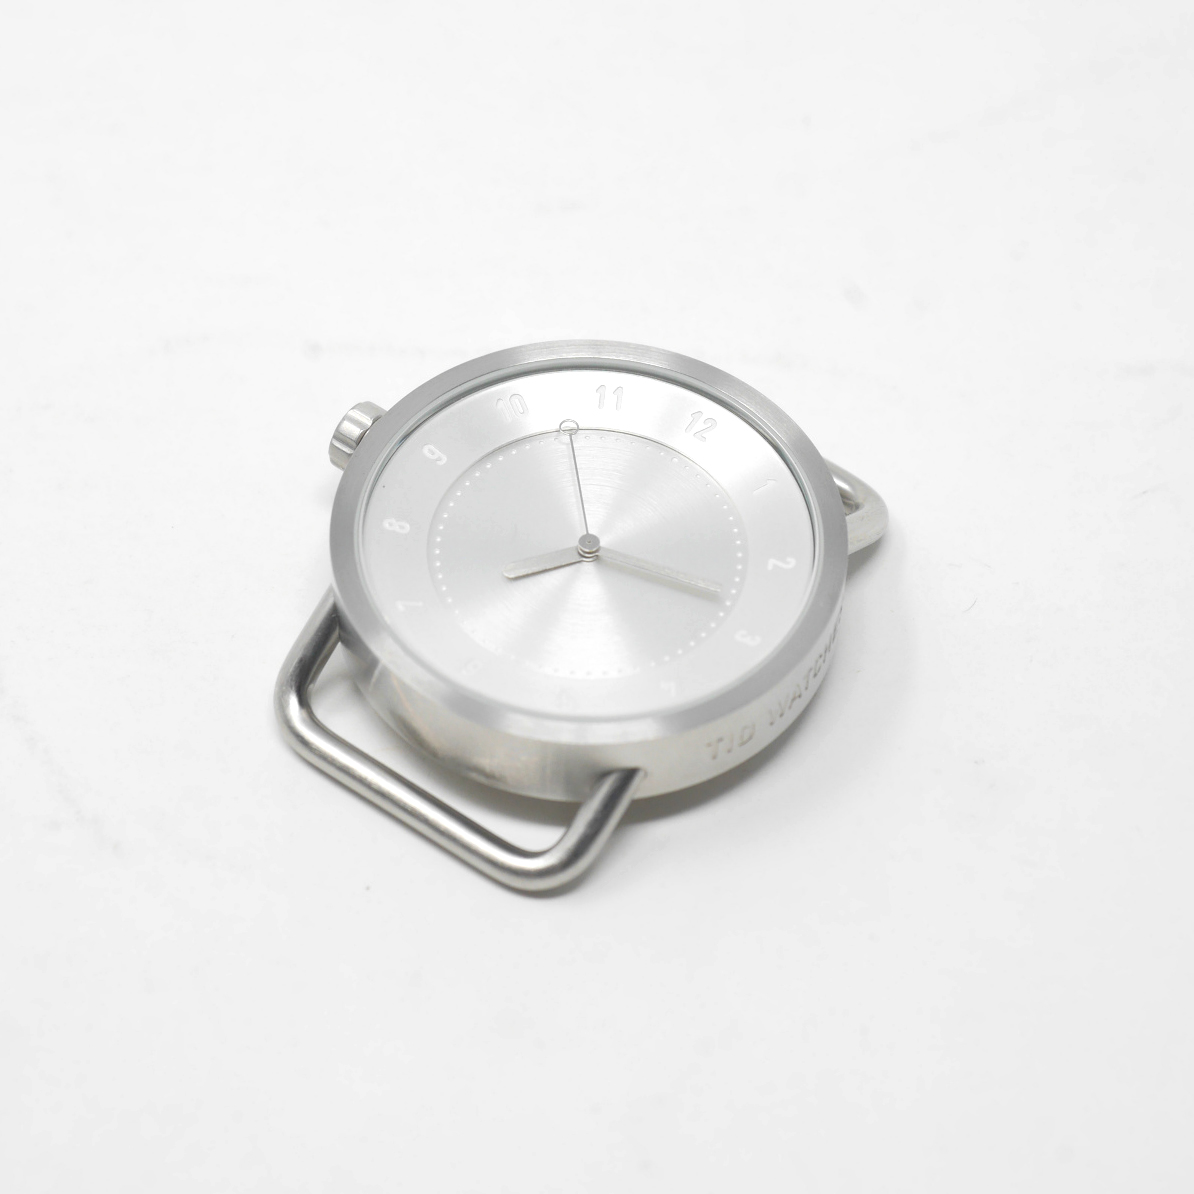 TID Watches No.1 40mm フェイス シルバー(ティッドウォッチ)※バンド別売